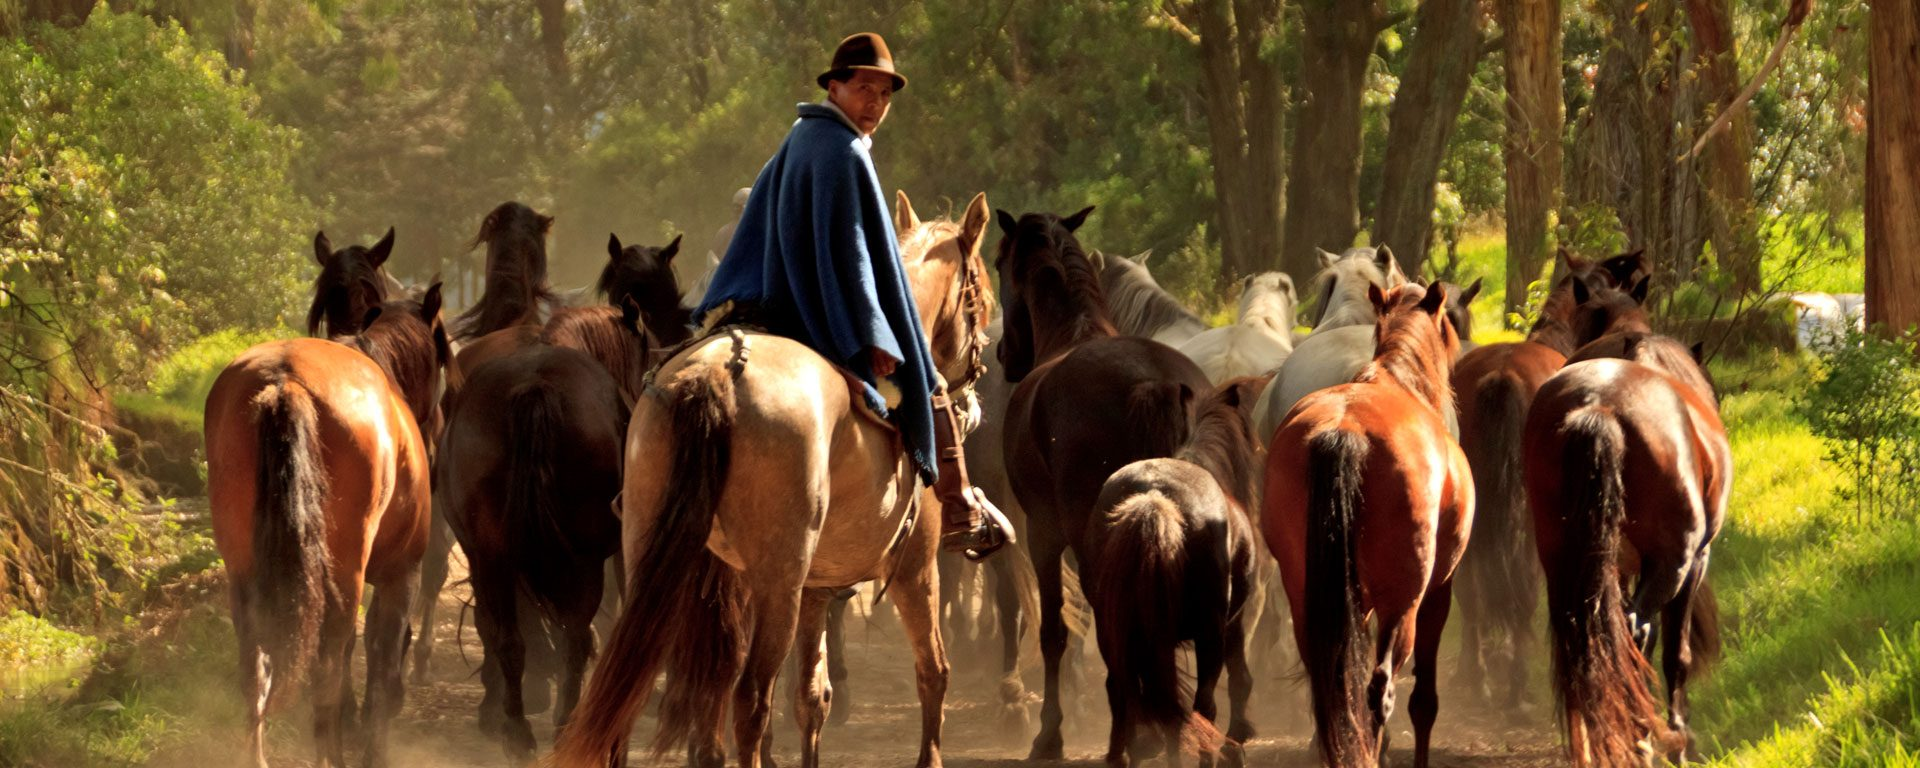 Man leading horses down a dirt road near Hacienda Zuleta in the highlands of Ecuador